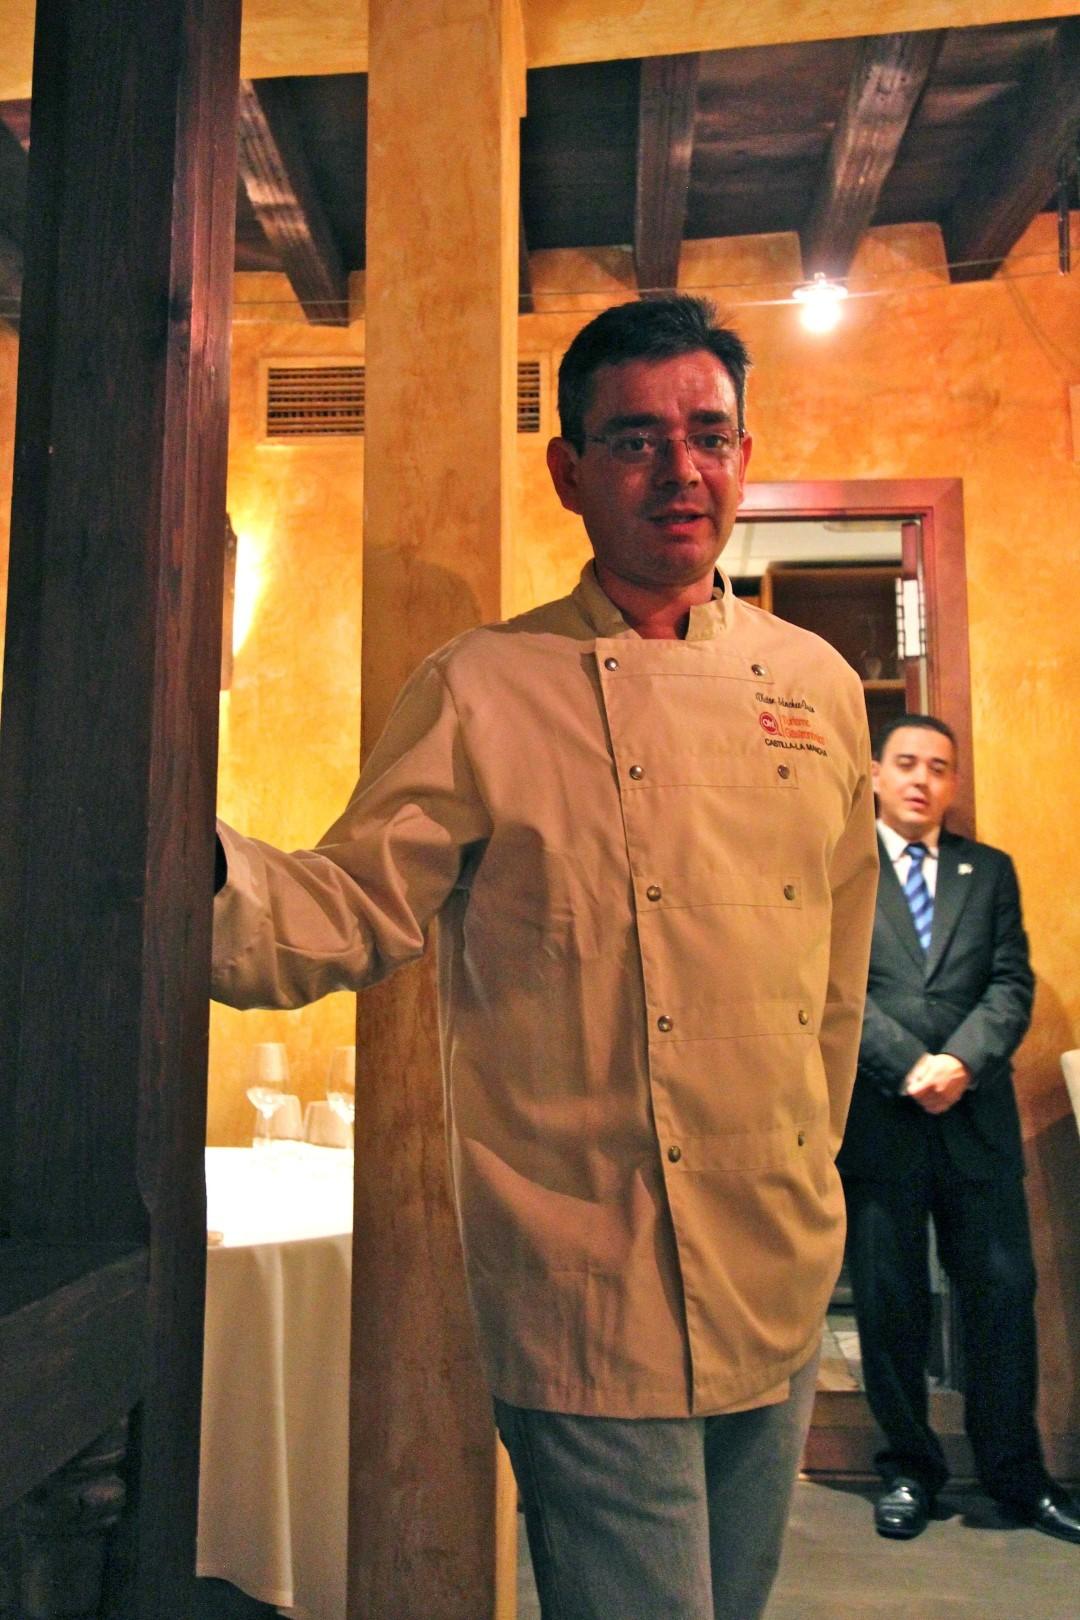 Chef Victor Sanchez-Beato, sommelier Eduardo Gallardo, Locum, Toledo, Spain, Sephardic, Travelers Roundtable, Robert Bundy